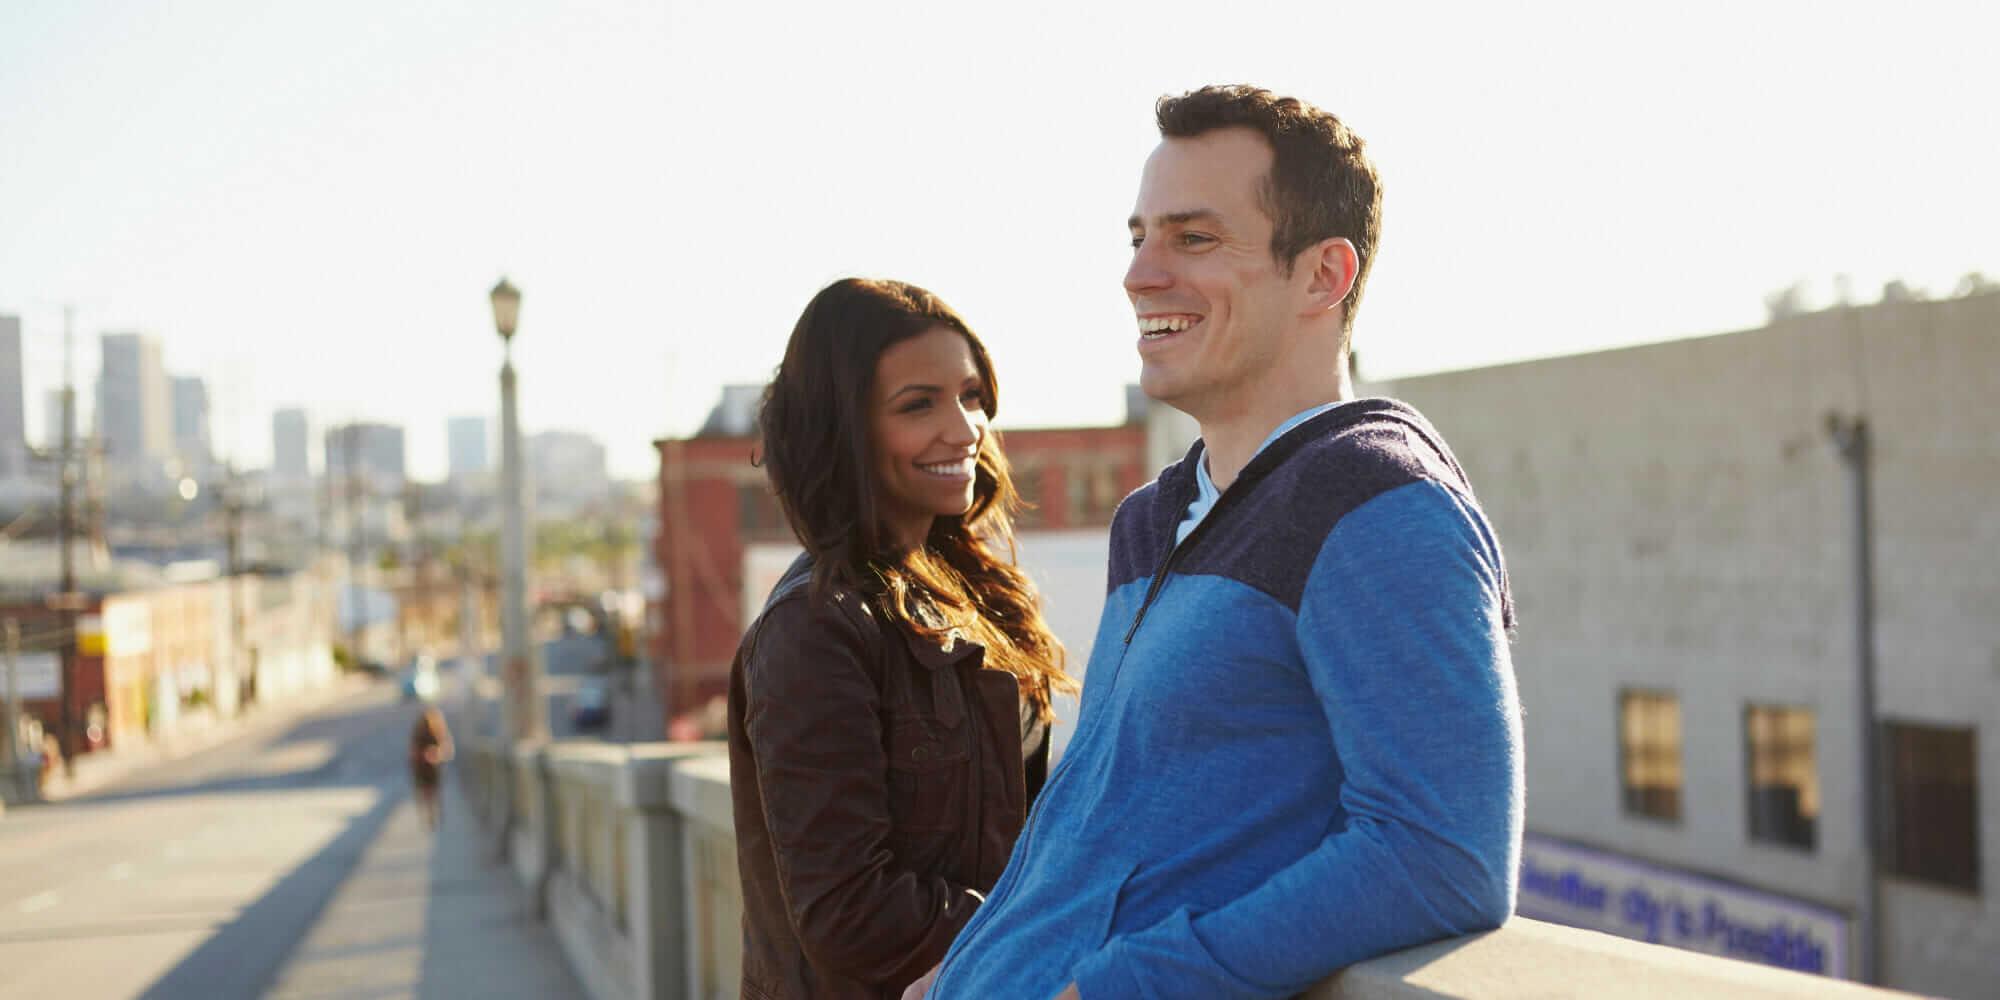 Couple chatting on bridge